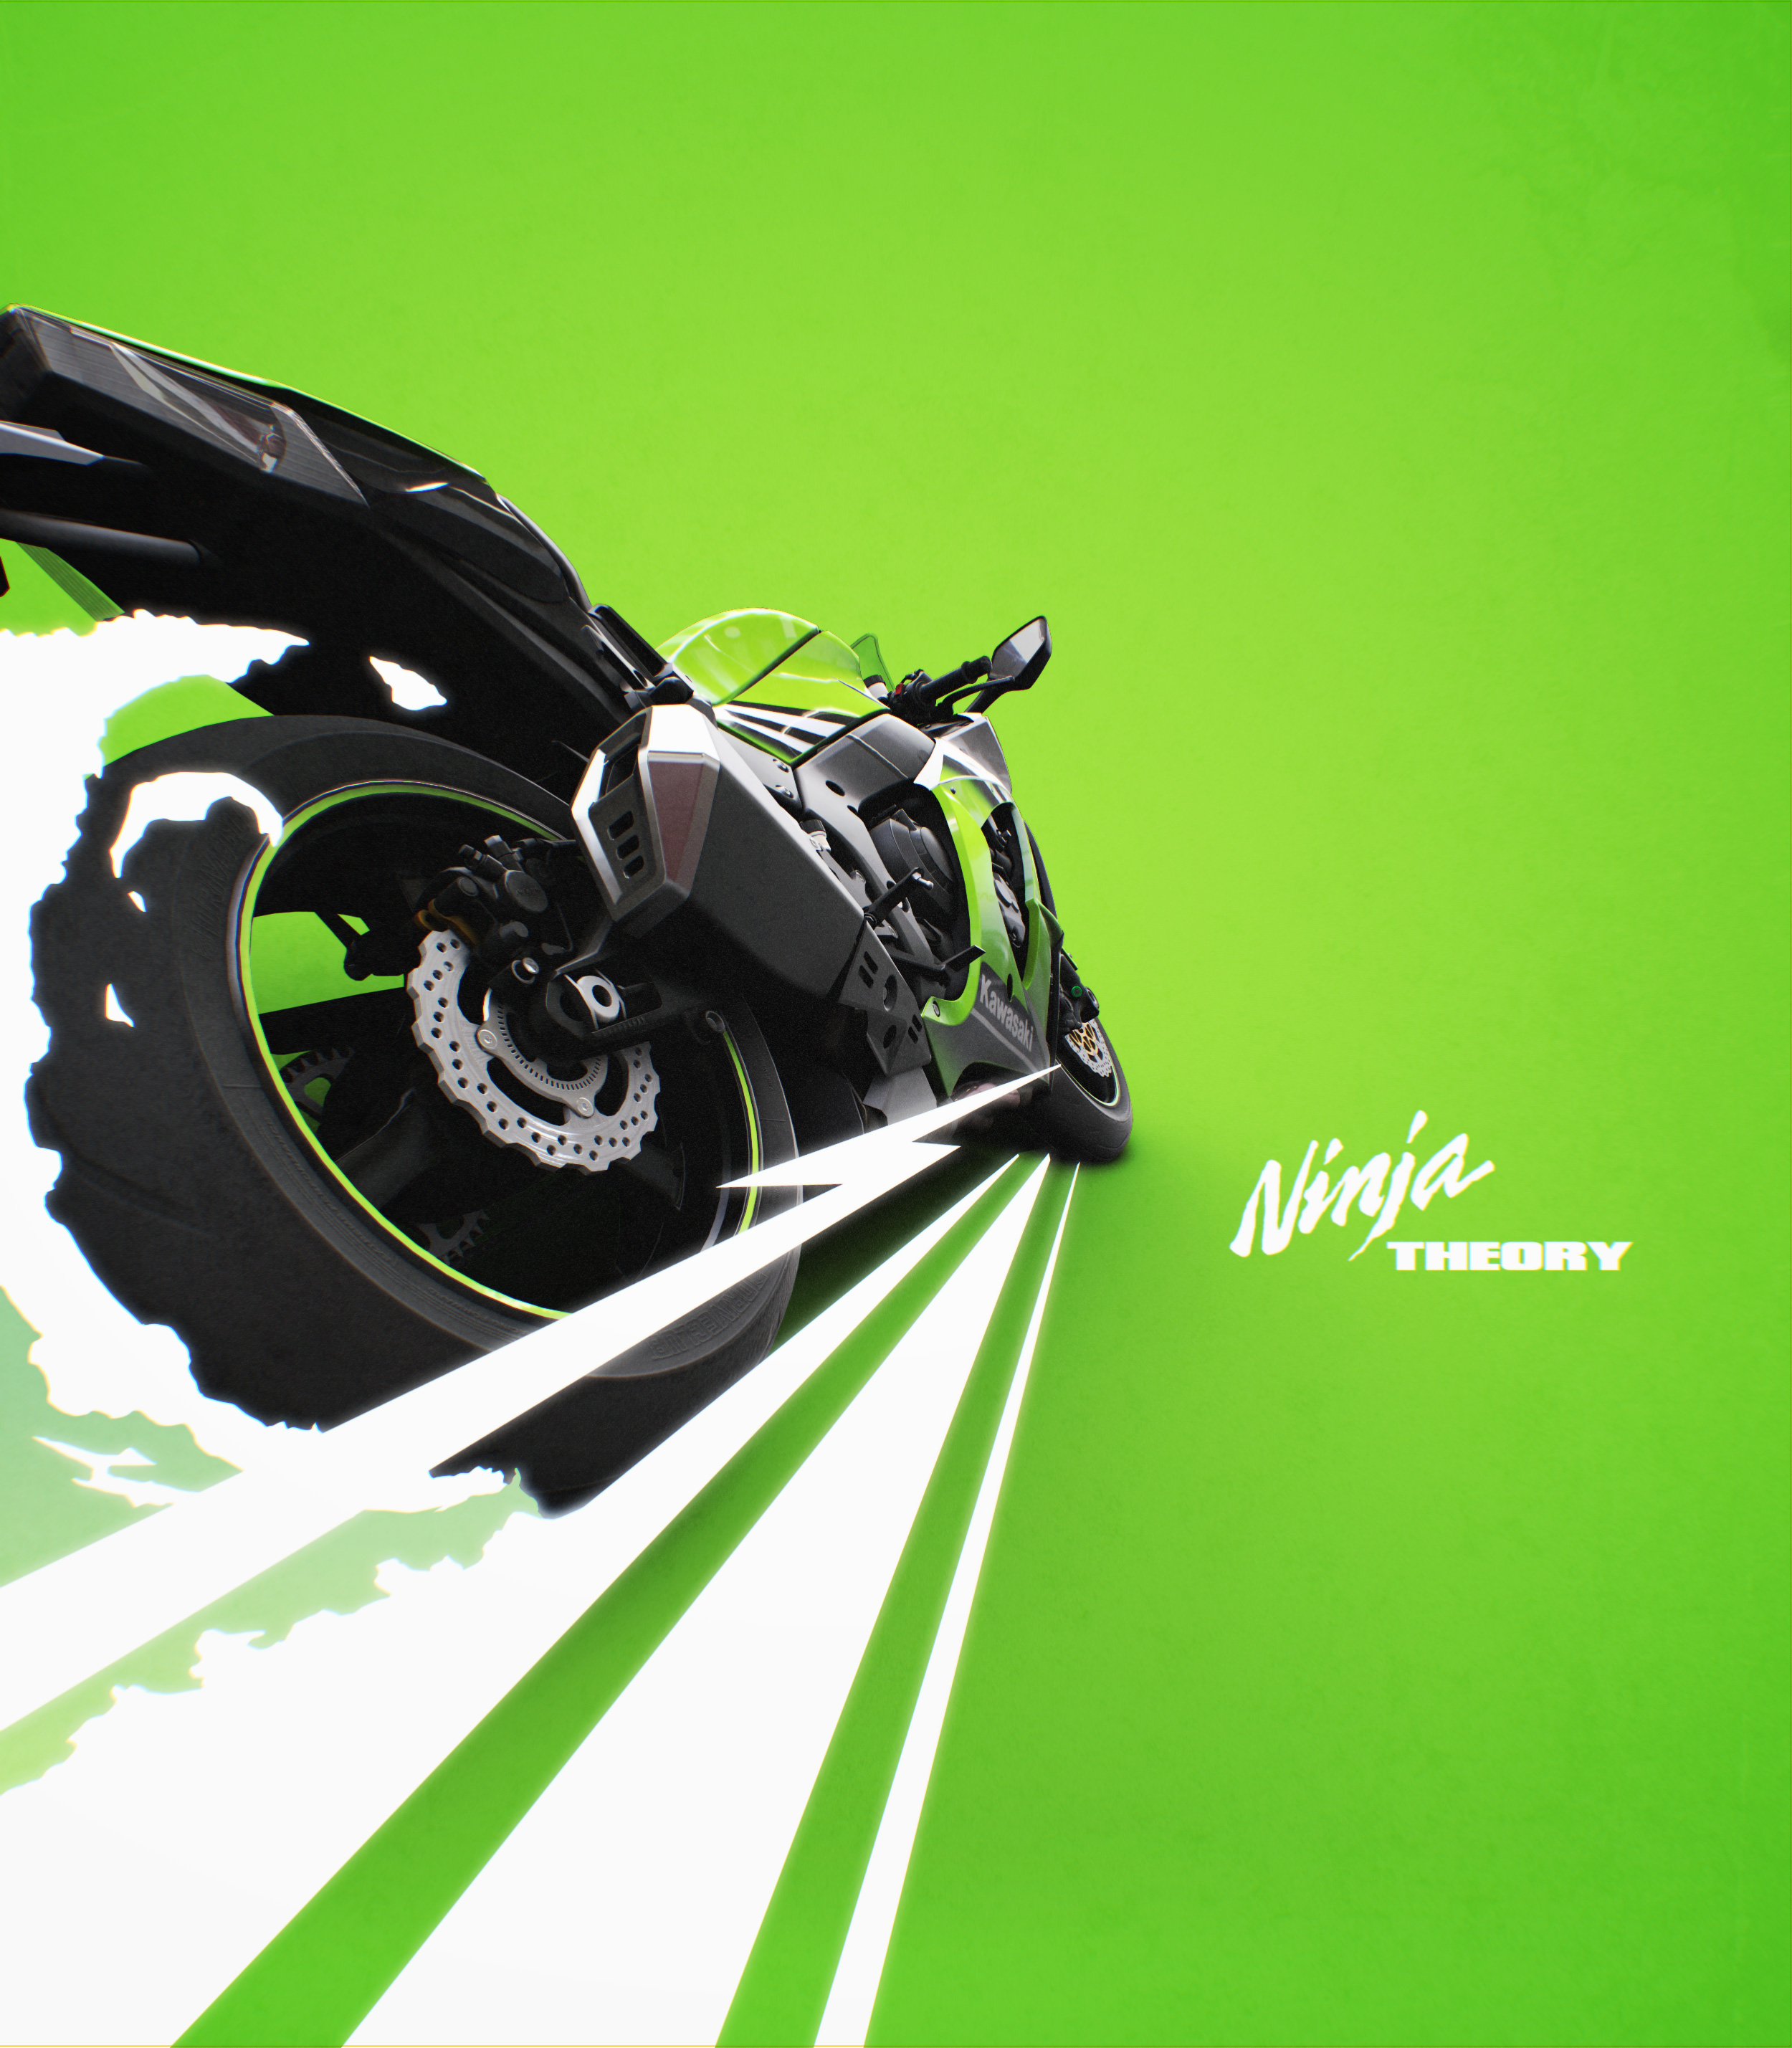 08_Kawasaki_ninja.jpg